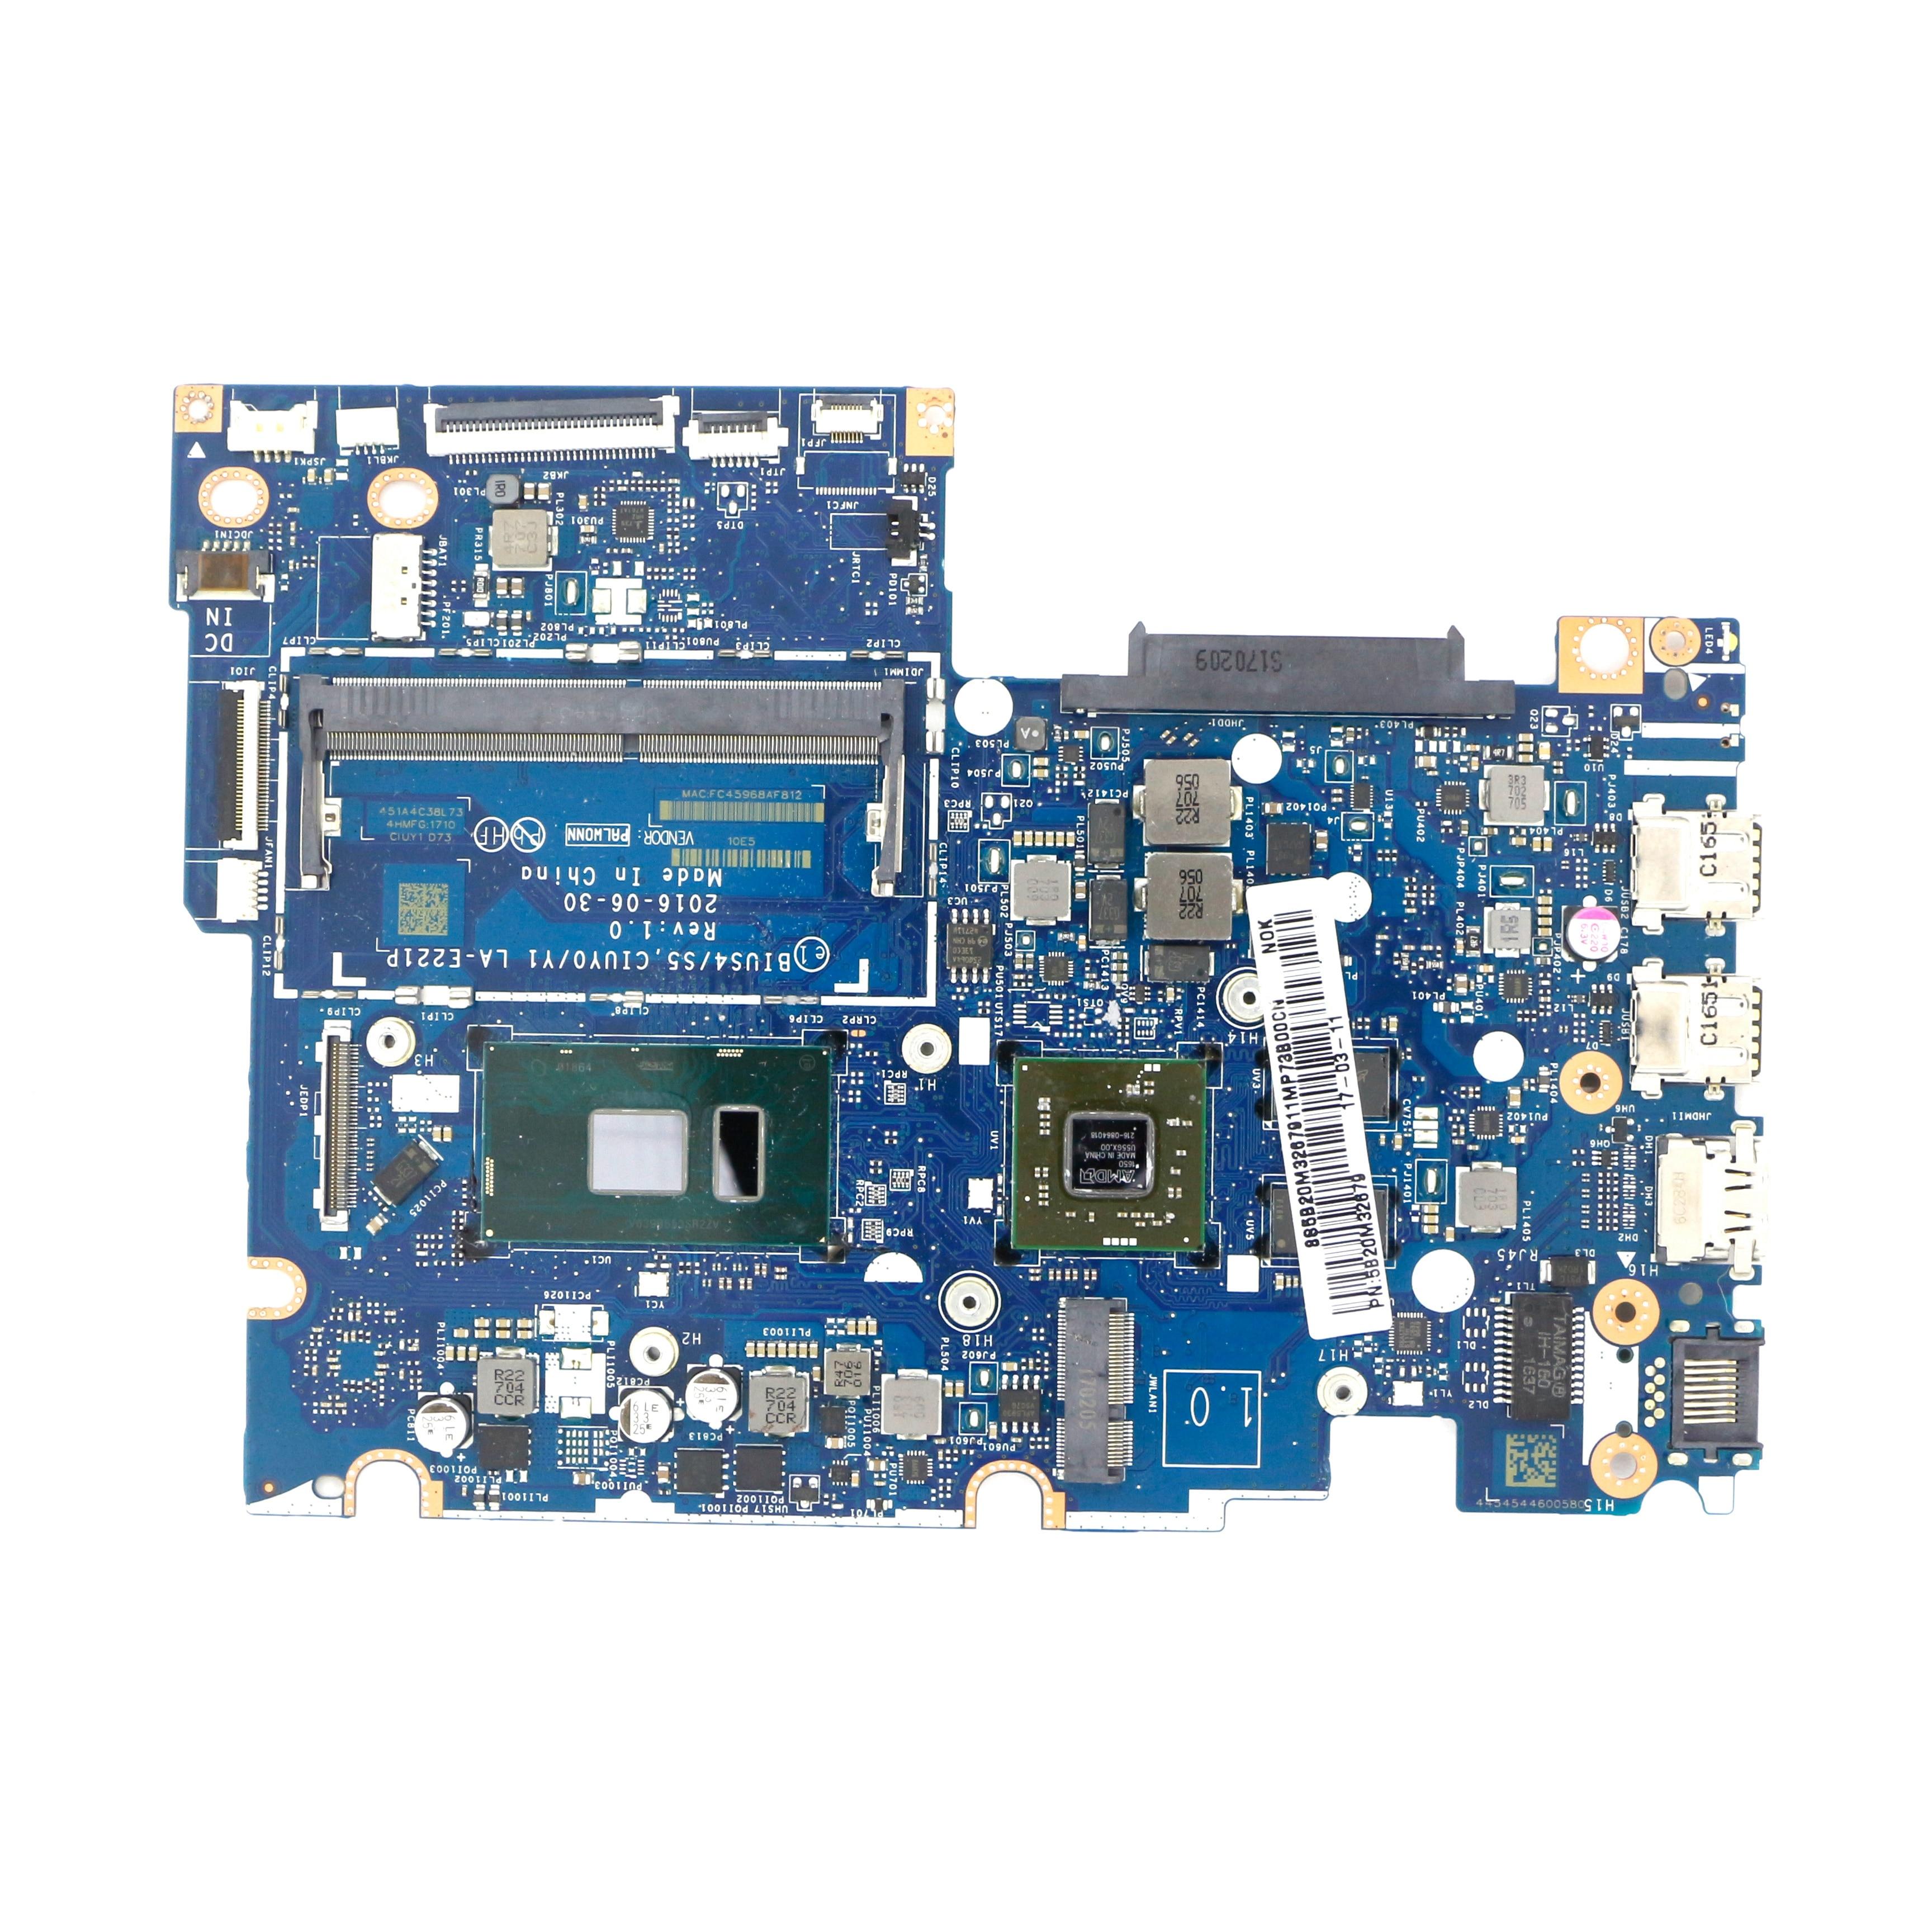 5B20M32679-المتقطعة اللوحة BIUS4/S5 CIUY0/Y1 LA-E221P w/ i7-7500U + R7 M360 لينوفو فليكس 4-1580